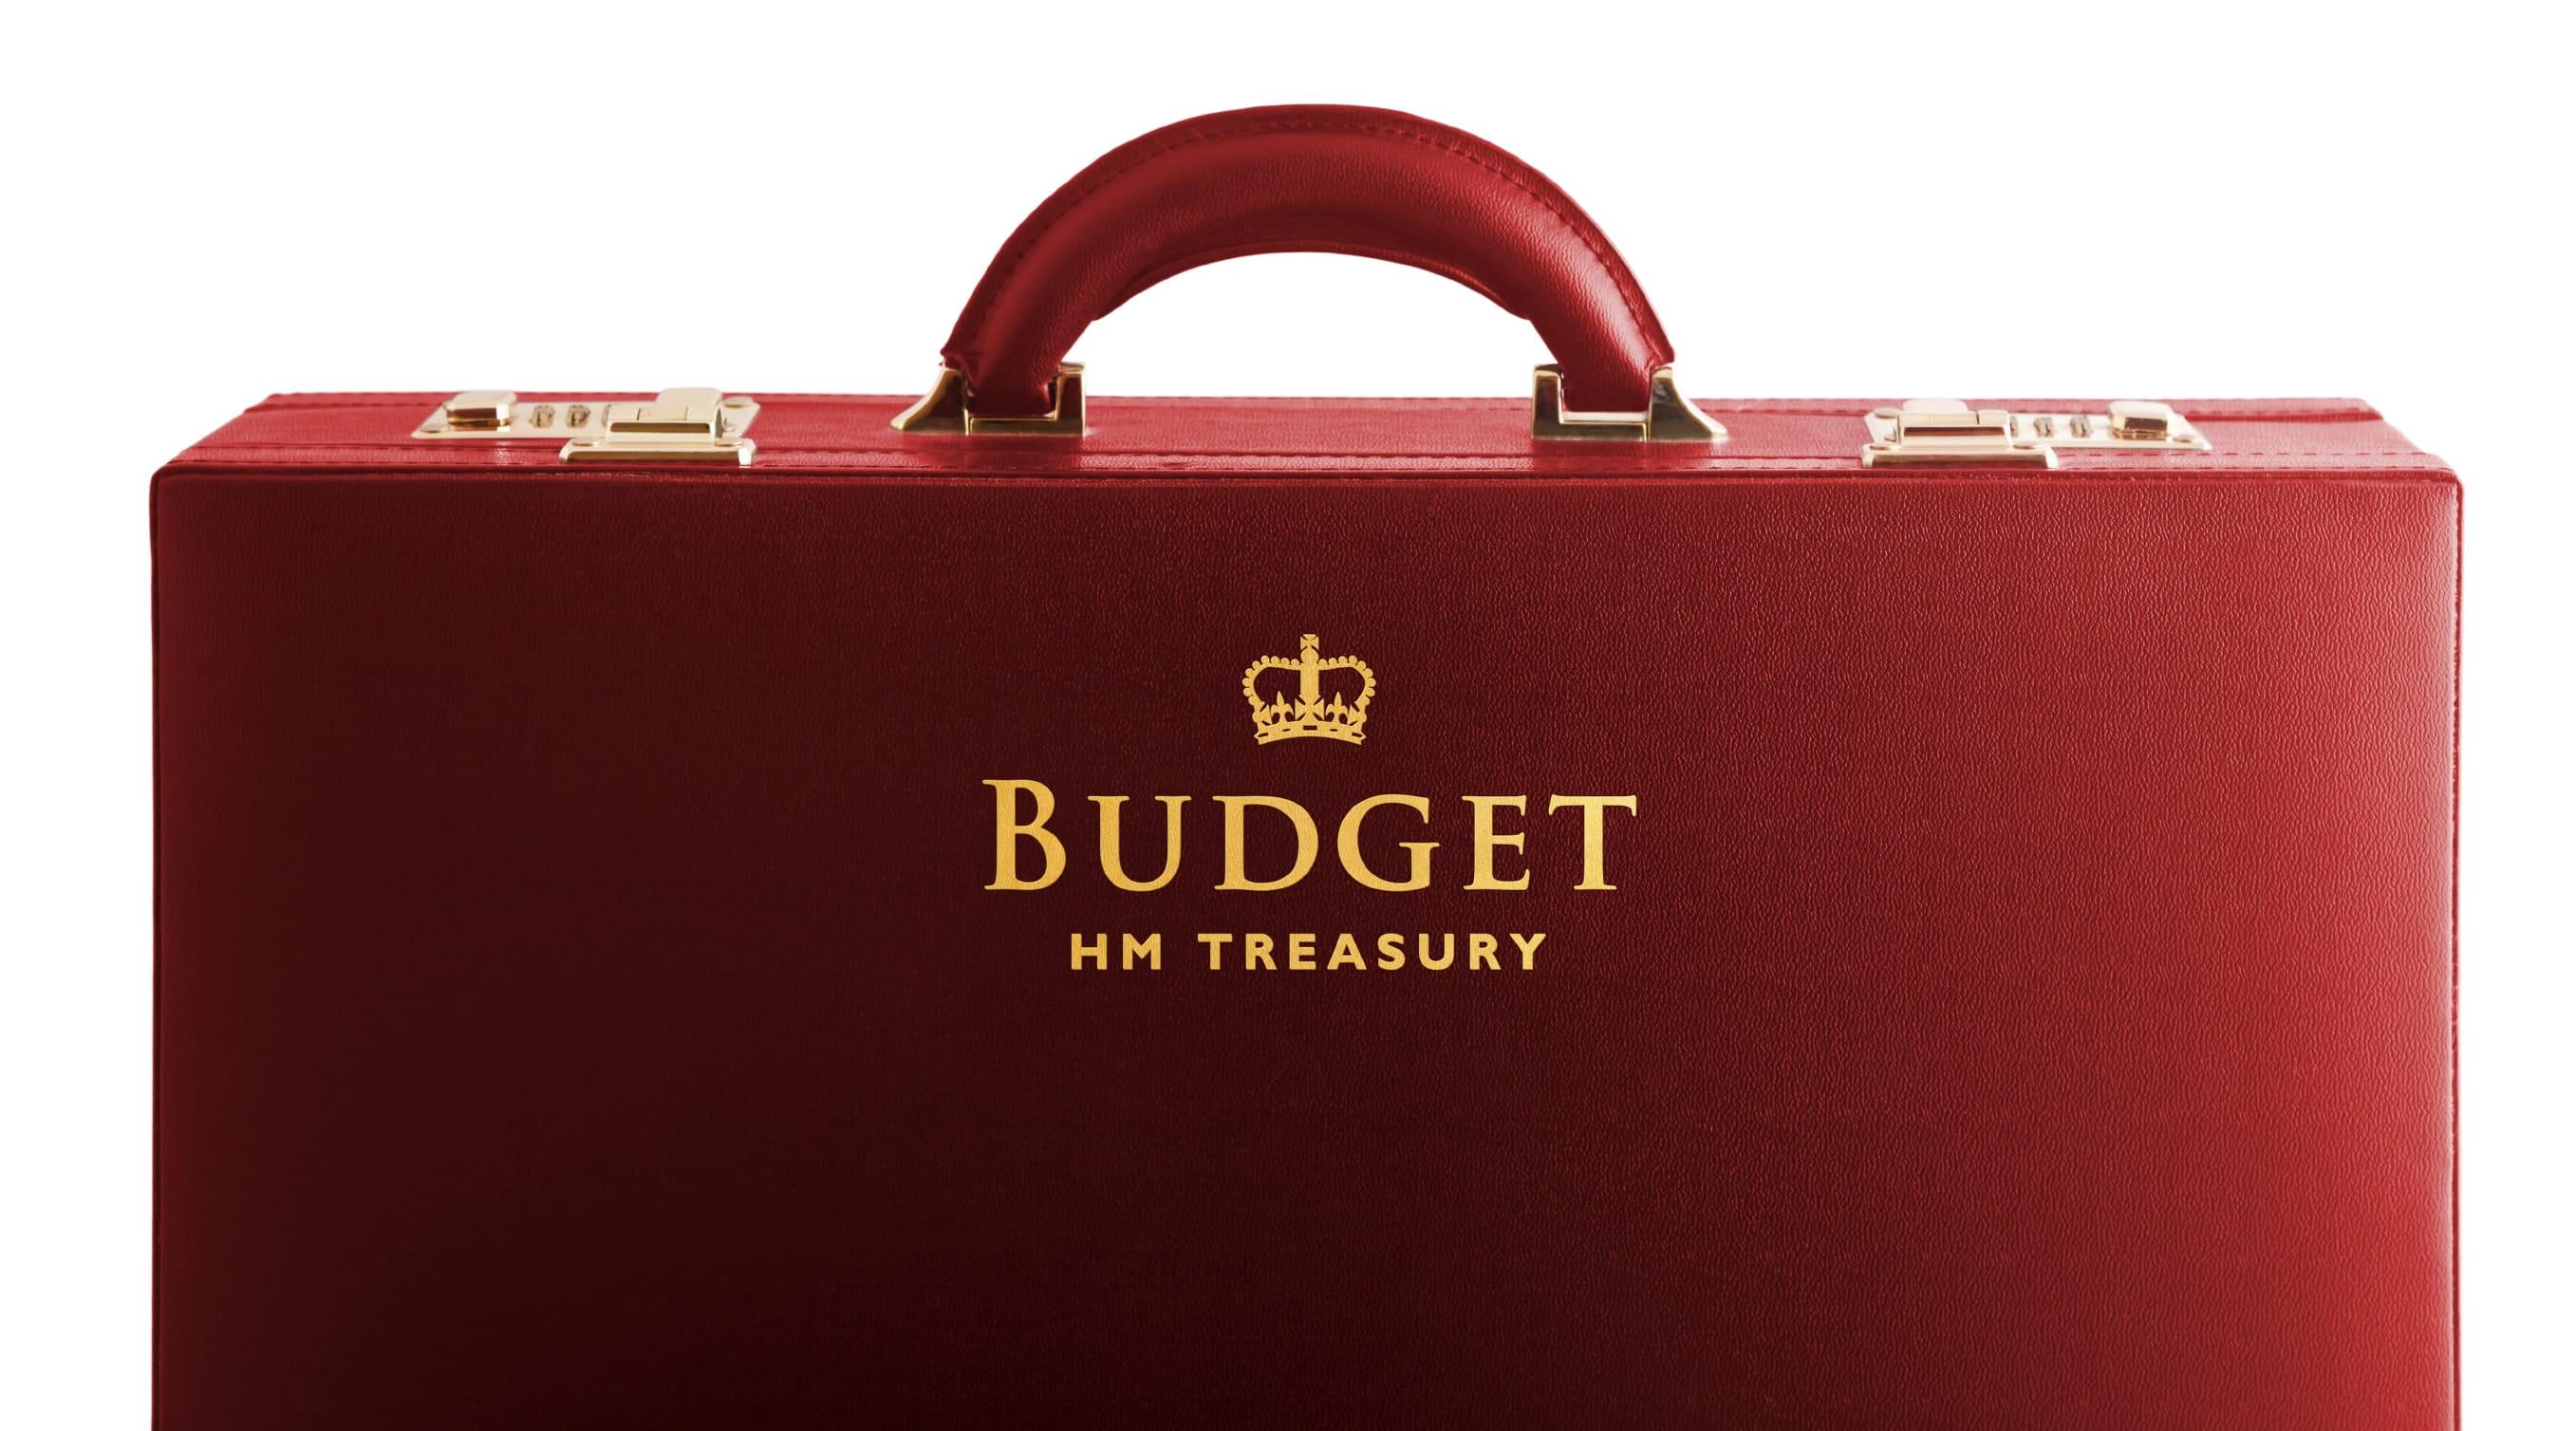 https://economia.icaew.com:443/-/media/economia/images/article-images/pensionsbudgetsuitasetreasury630-min.ashx